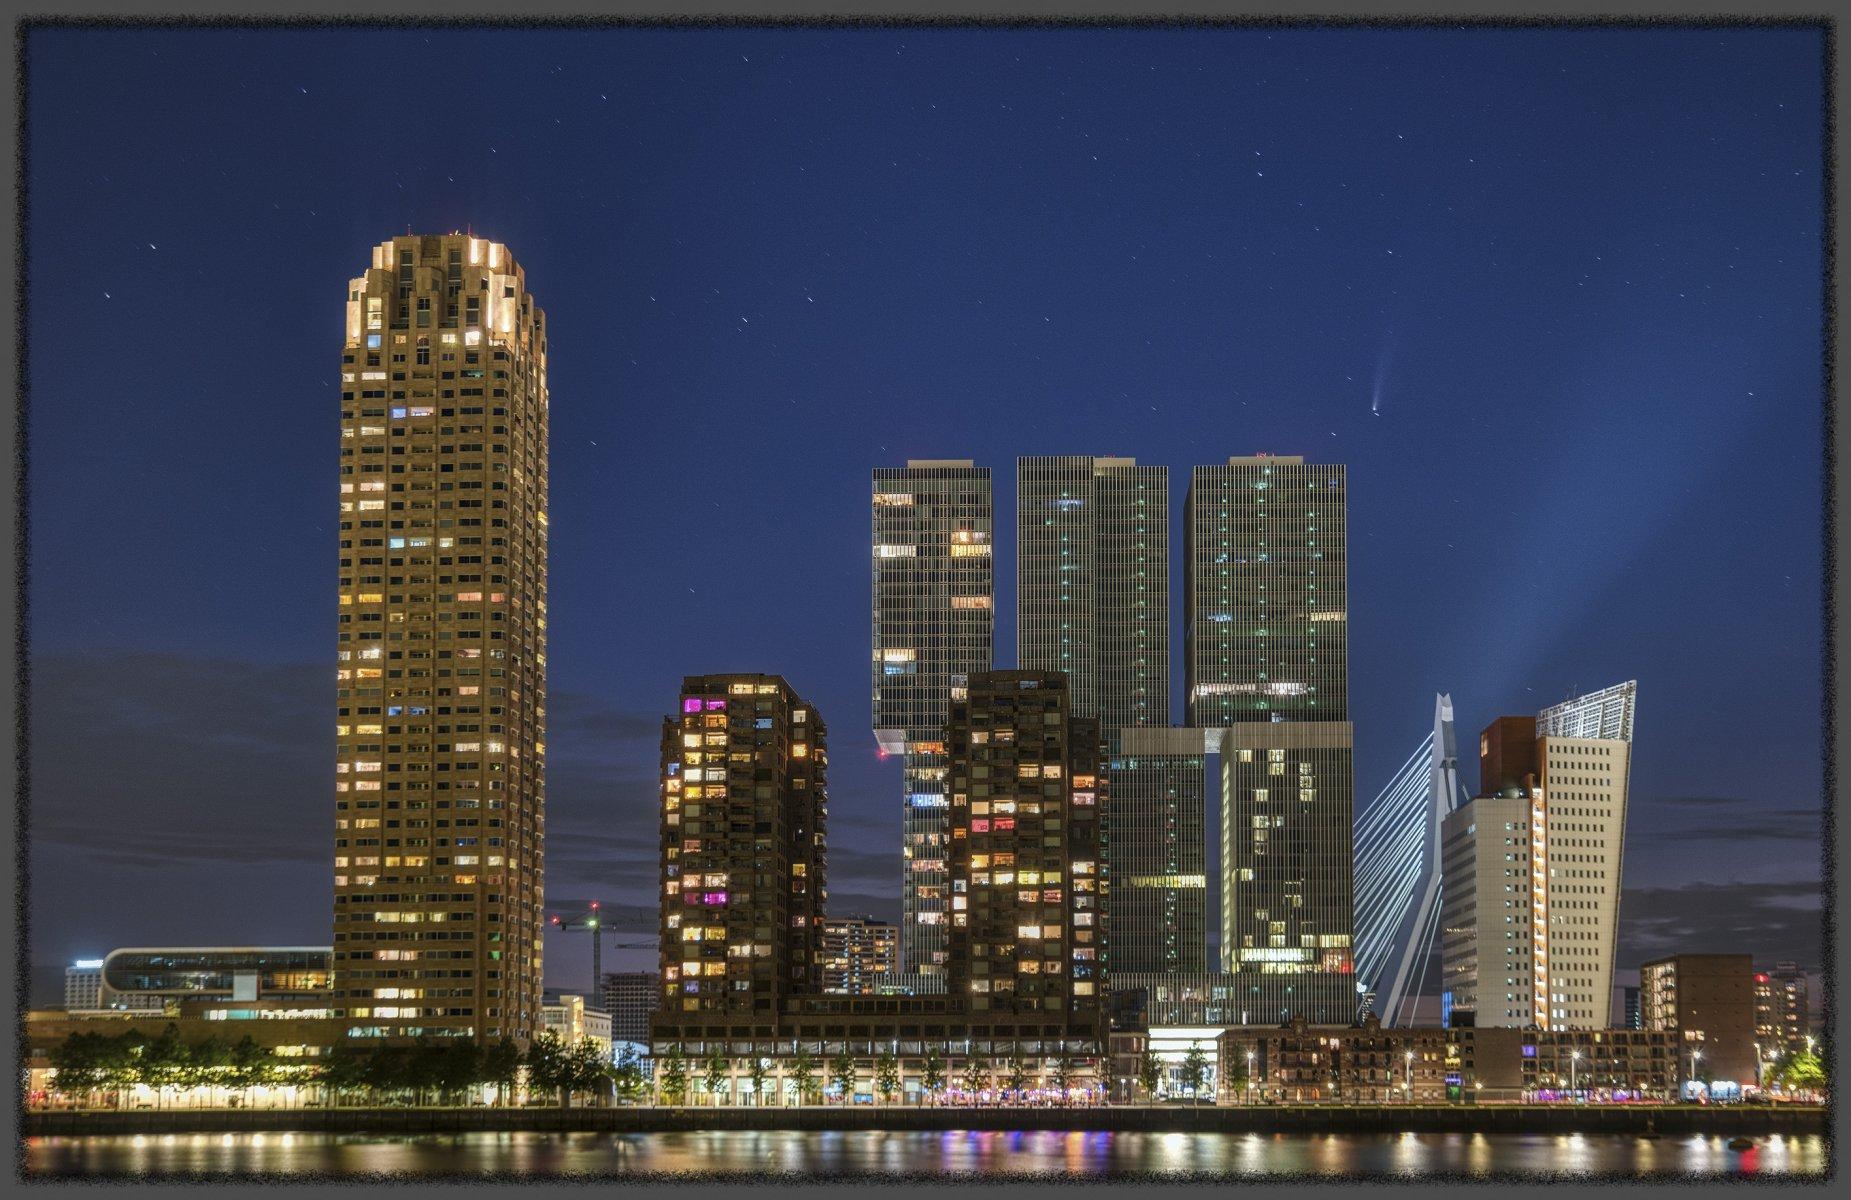 Rotterdam_KopvanZuid_komeet-18072020-border.jpg